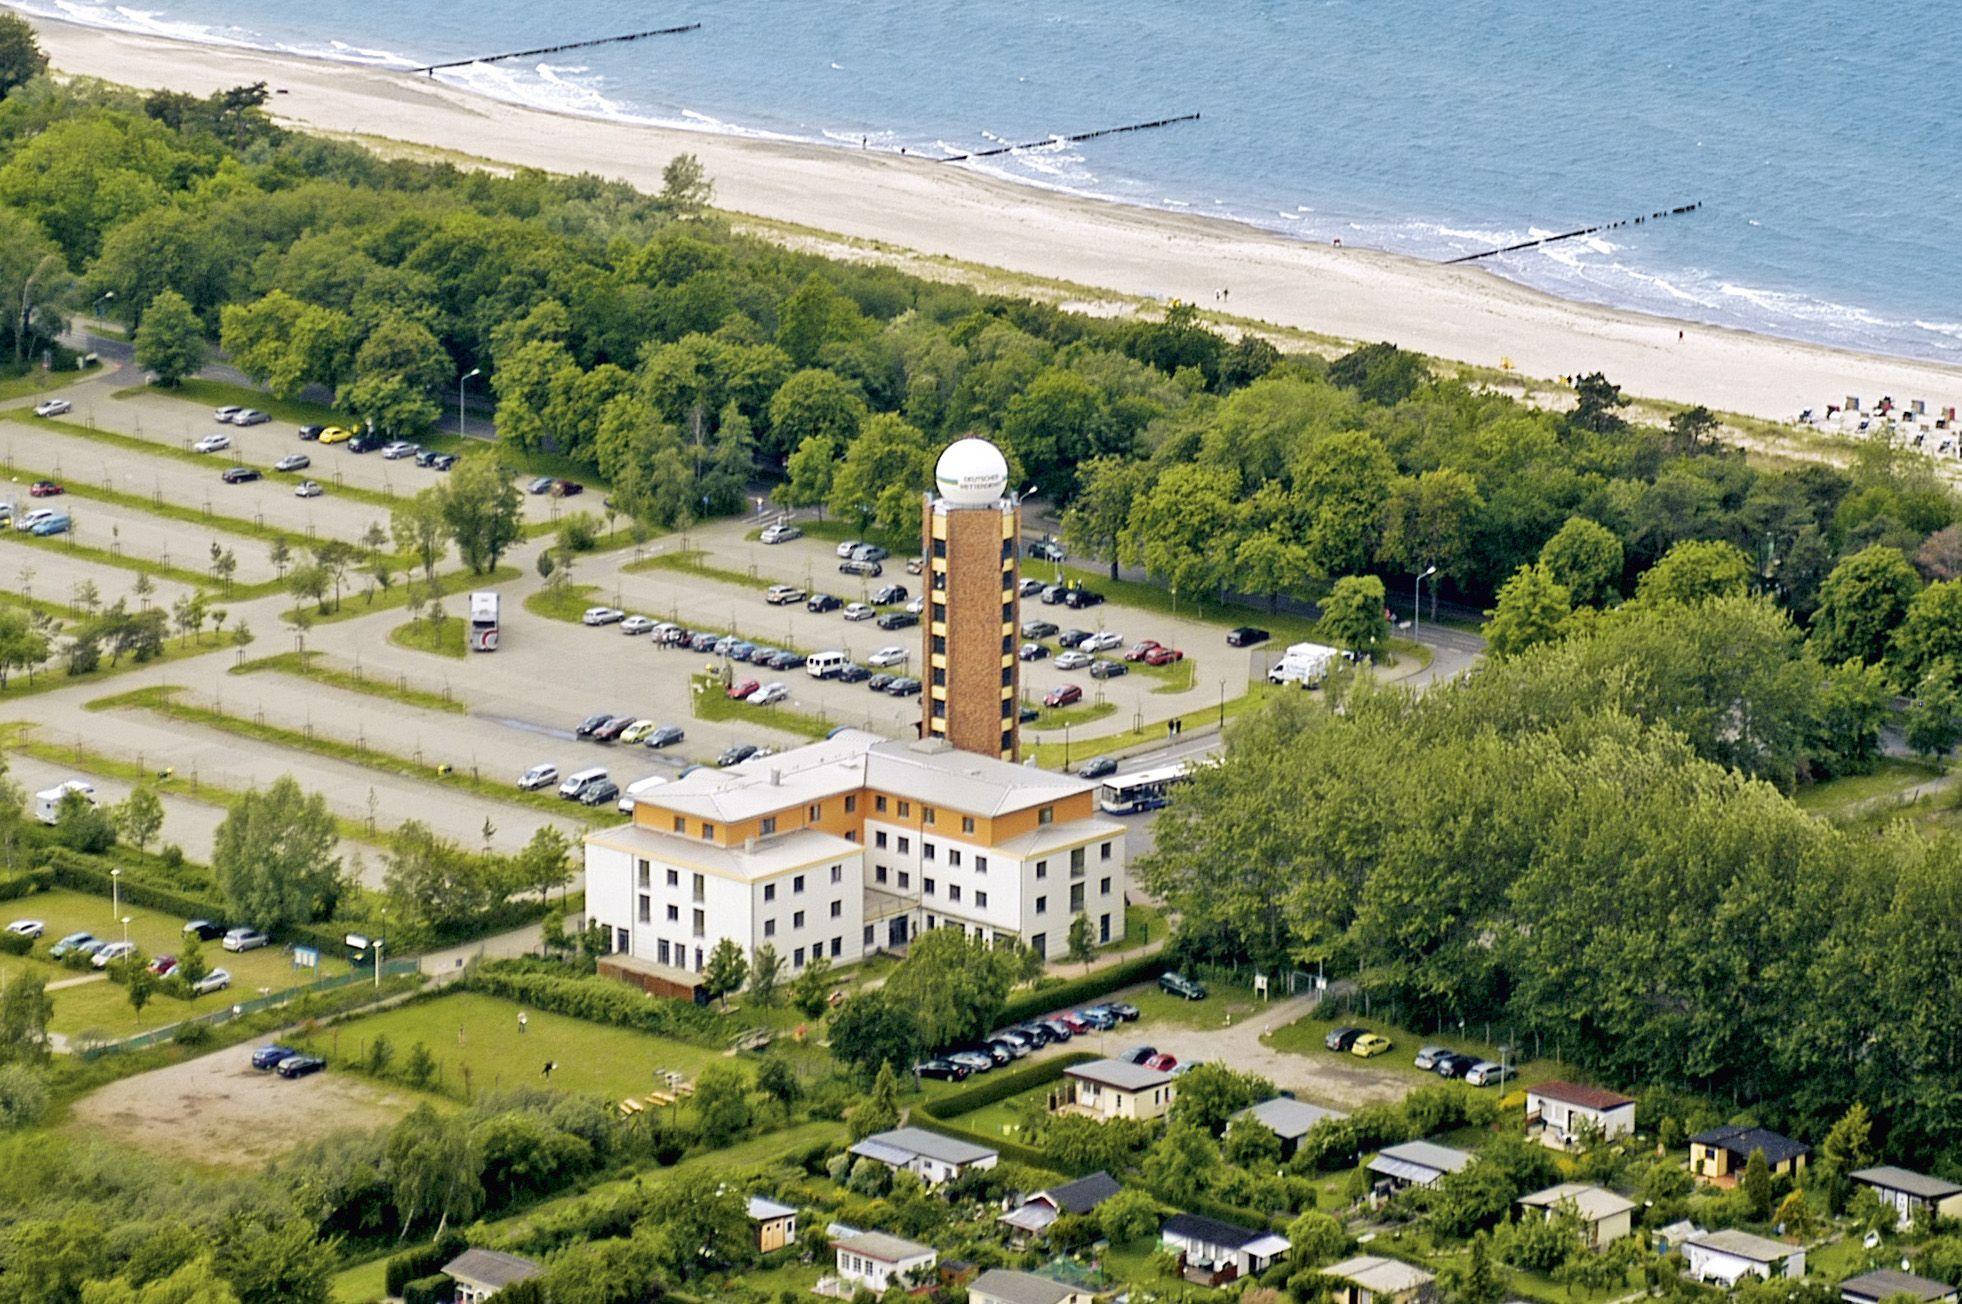 Jugendherberge Rostock Warnemünde aus der Luft